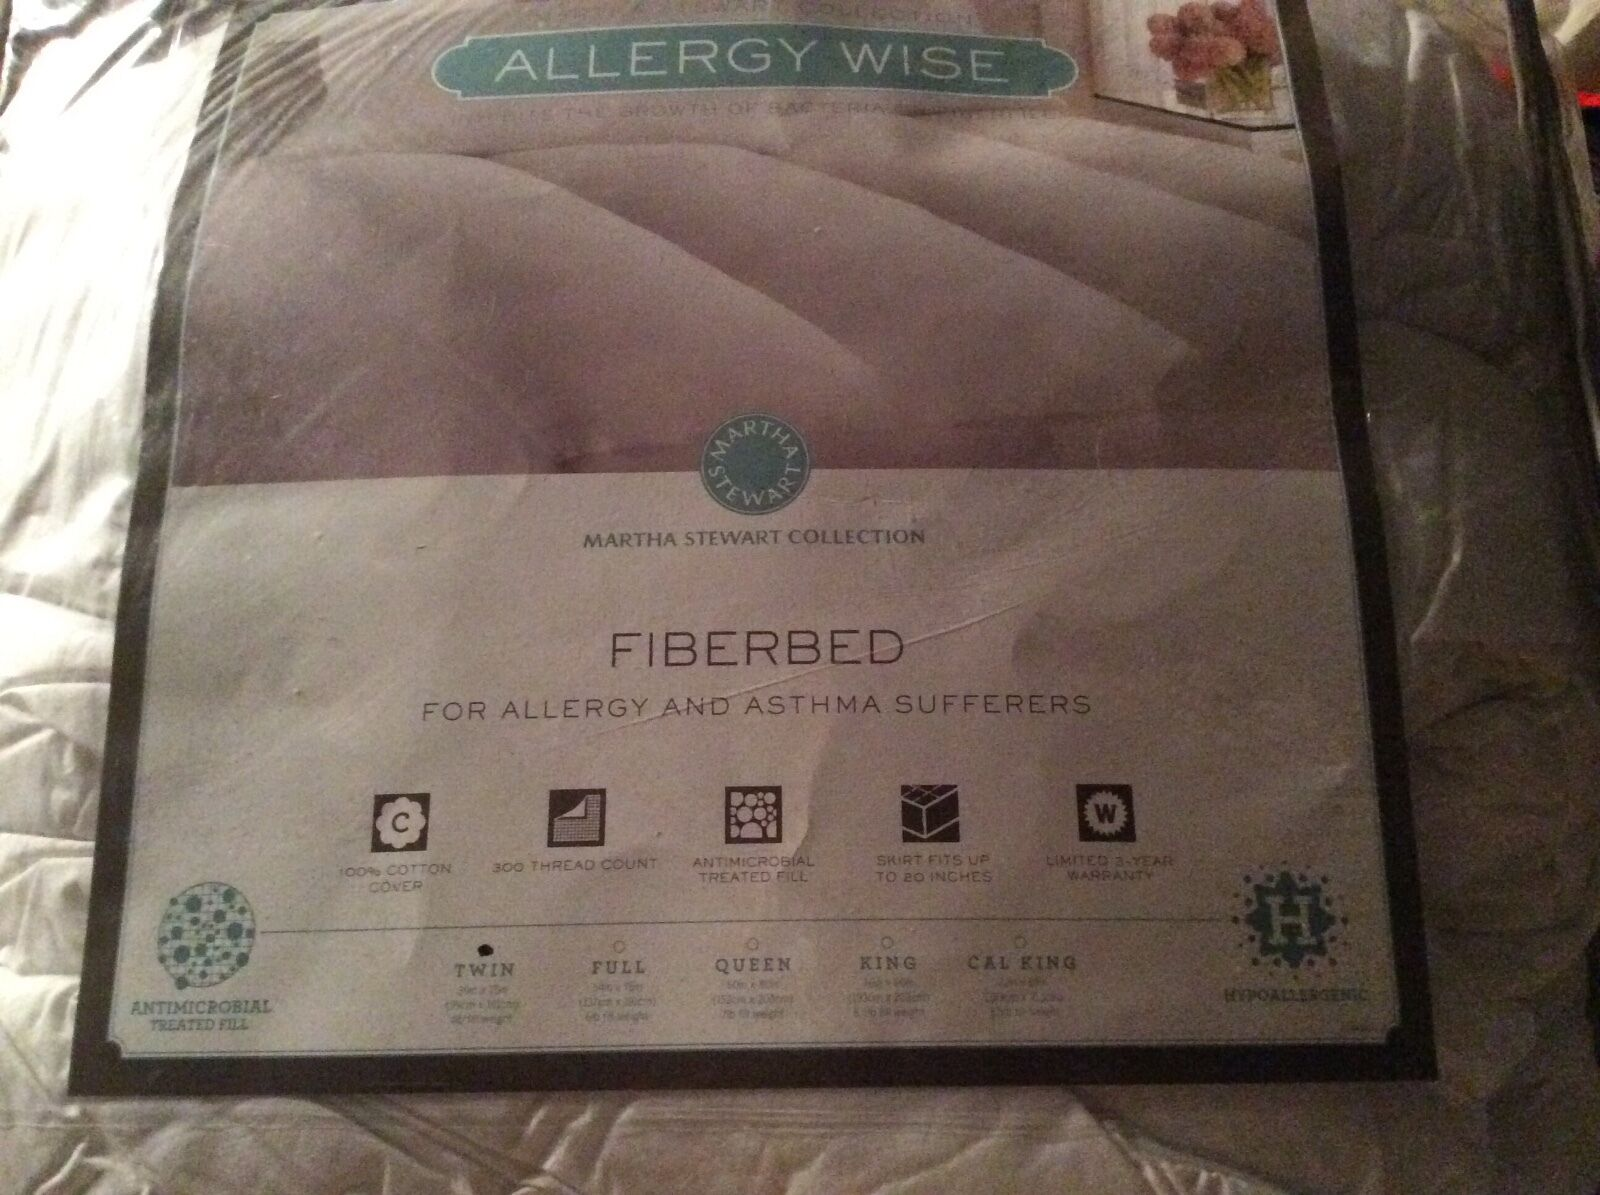 Martha Stewart Collection Fiberbed Allergy Wide Wide Wide Twin Hypoallergenic New de8fe9